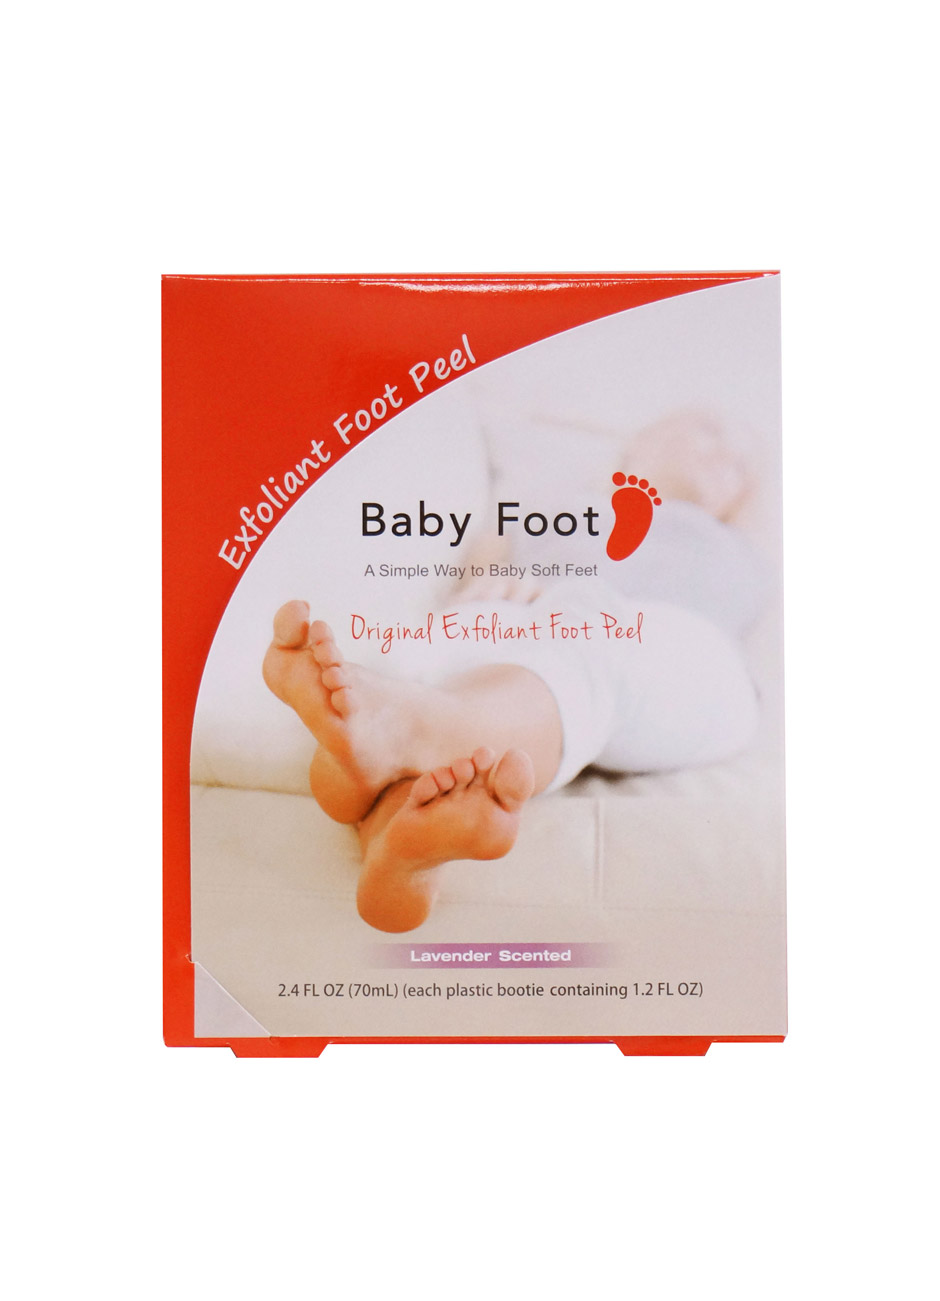 Baby Foot Exfoliant Foot Peel Nitrolicious Com